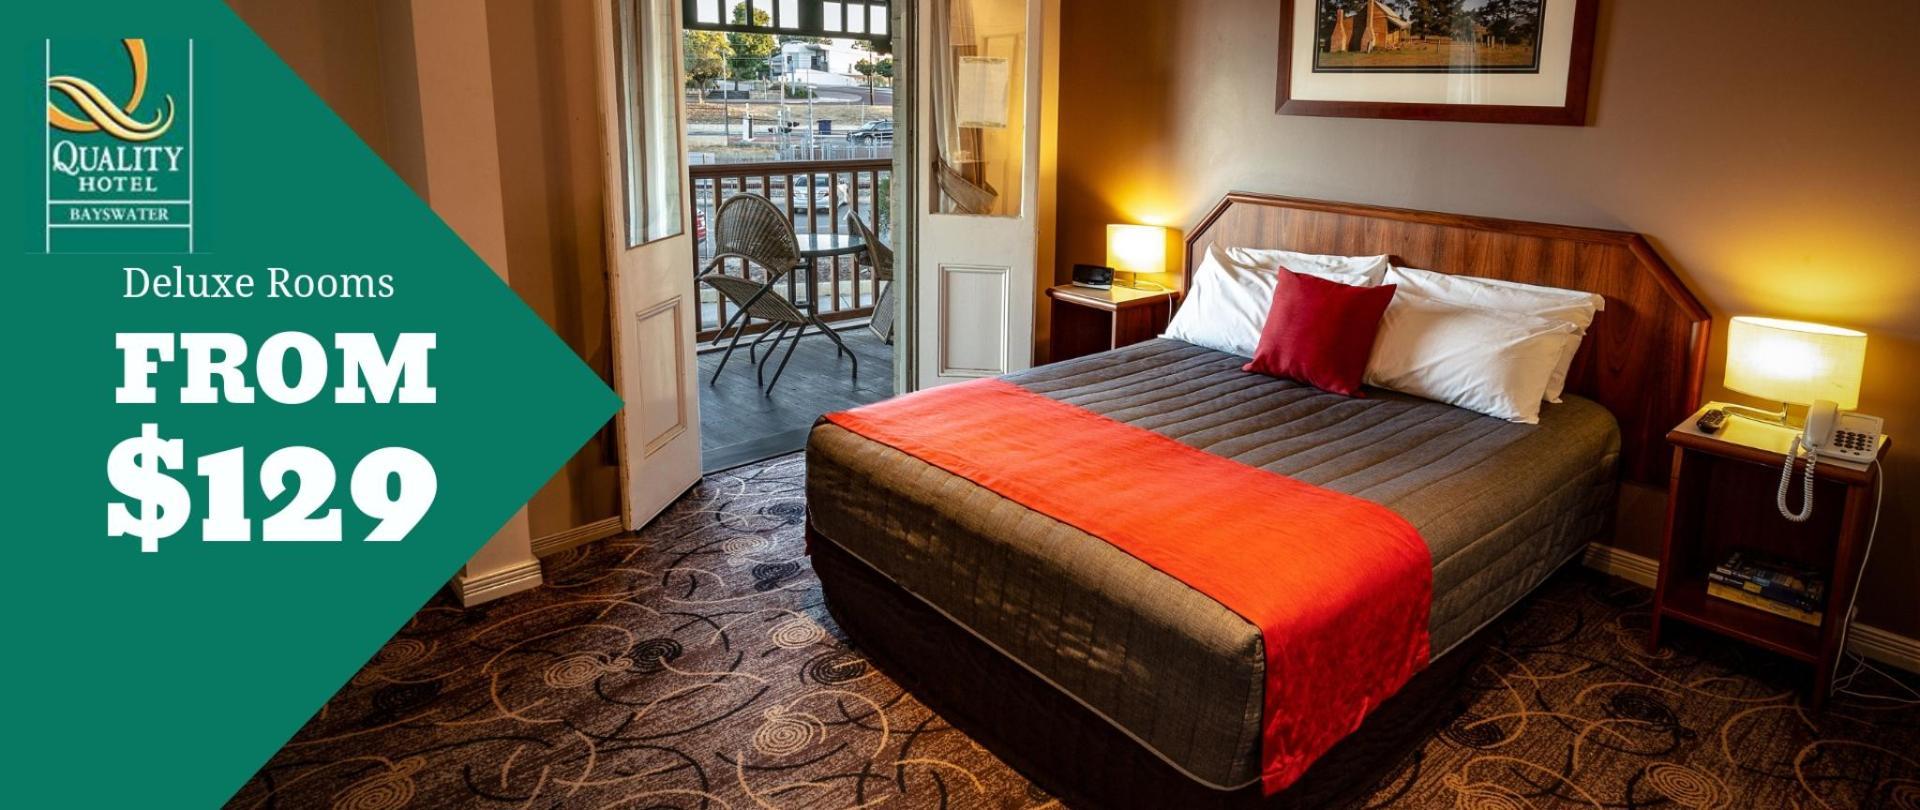 STQ Room and Price.jpg